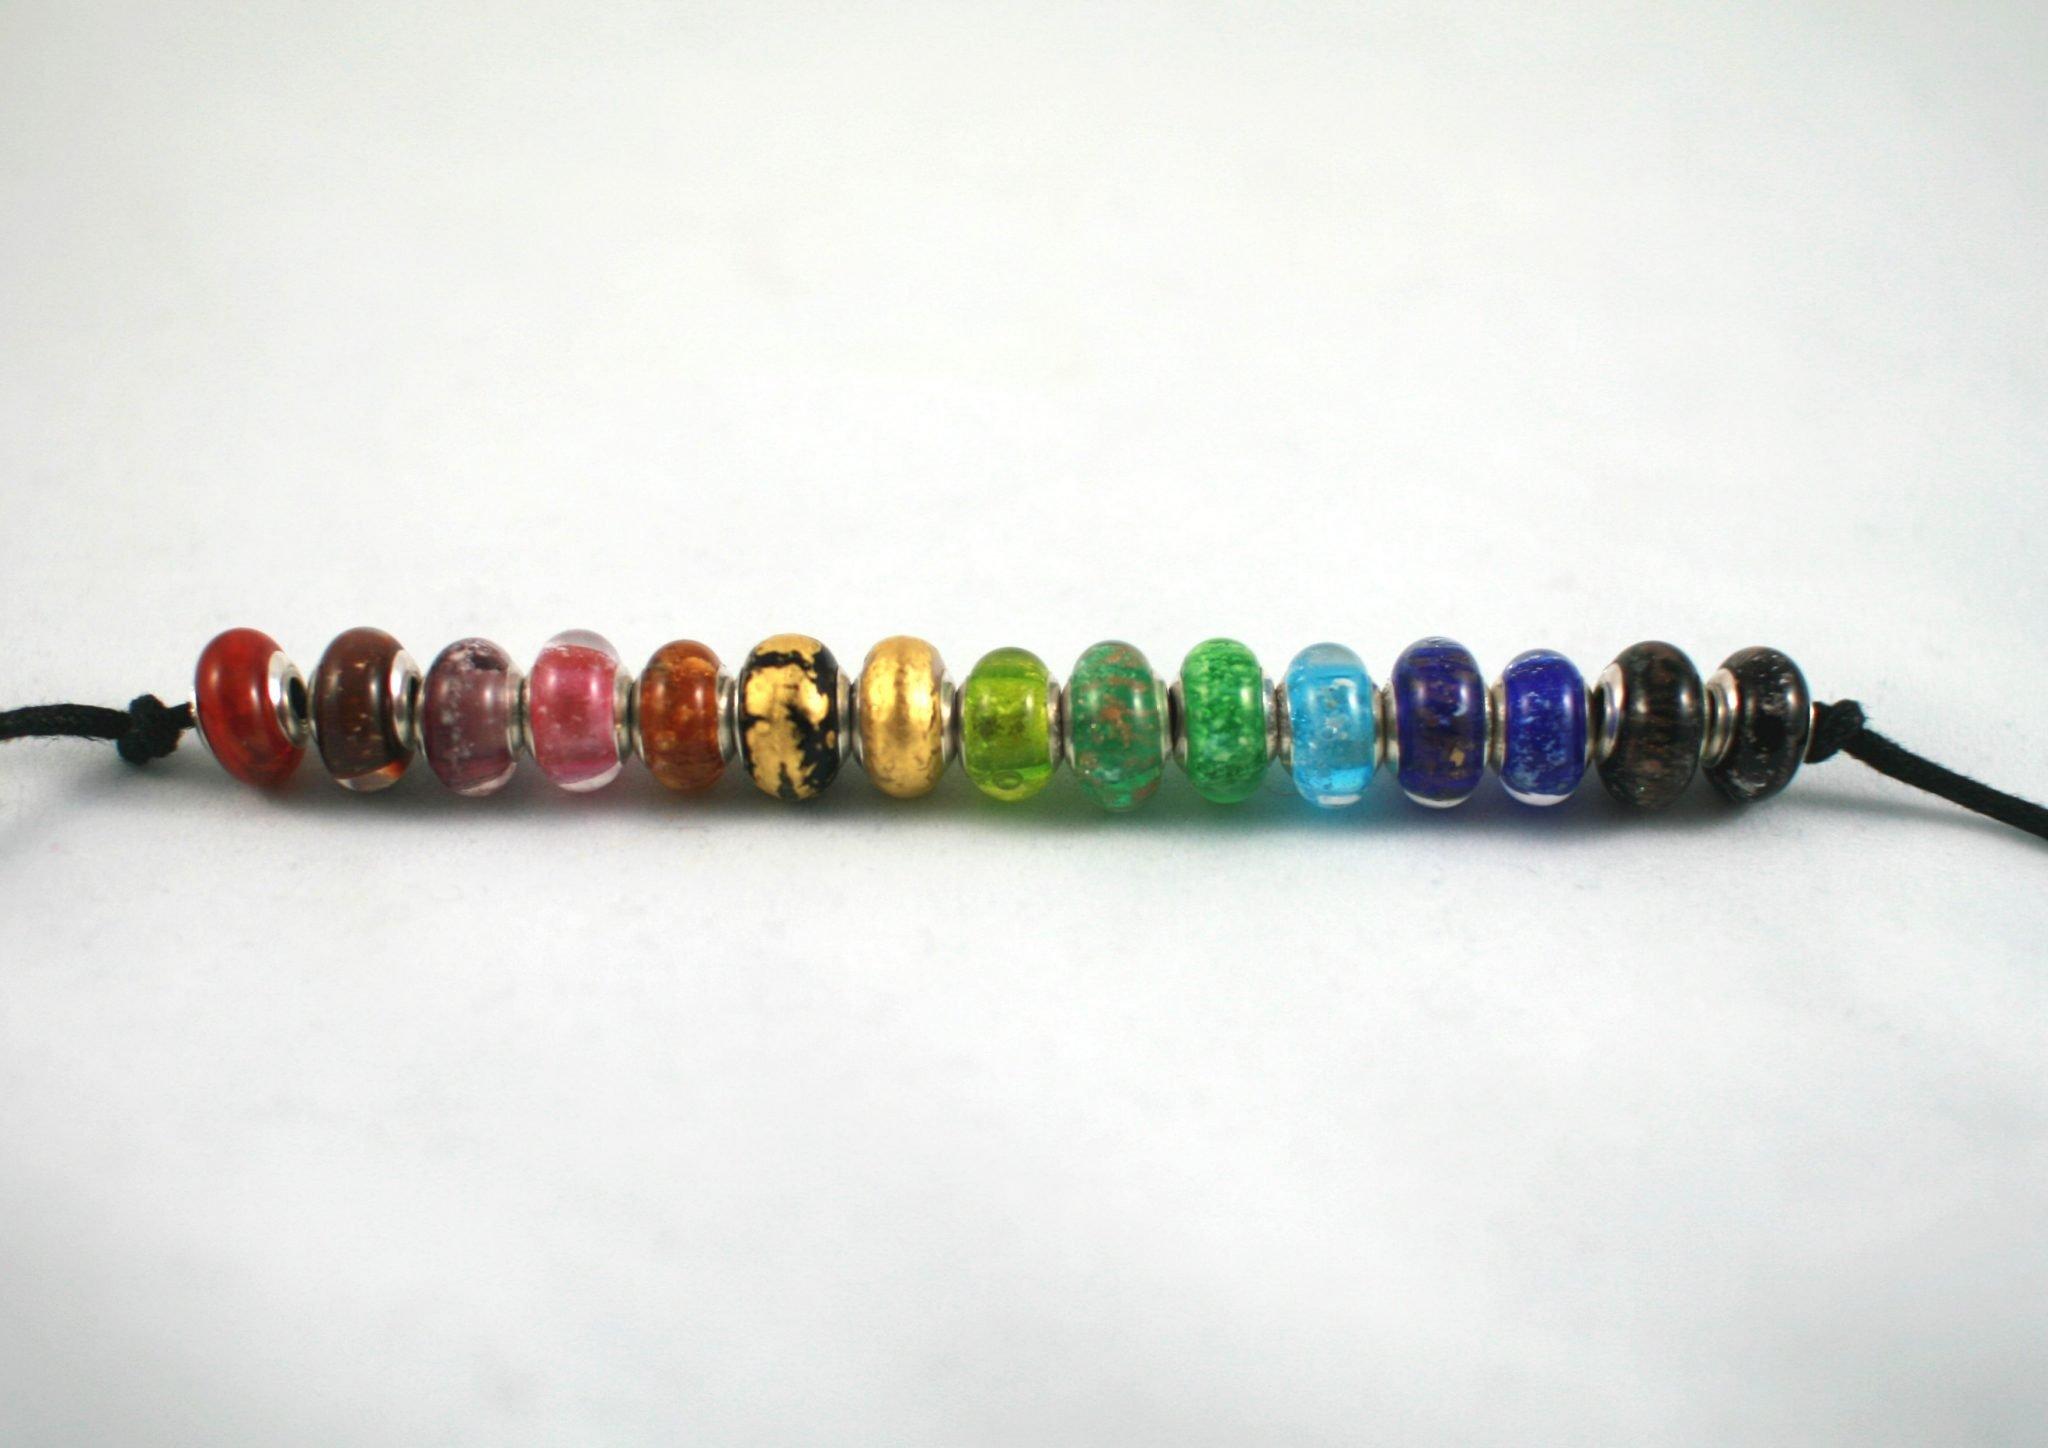 Pandora Style Memorial Charm Beads Range 925 Silver